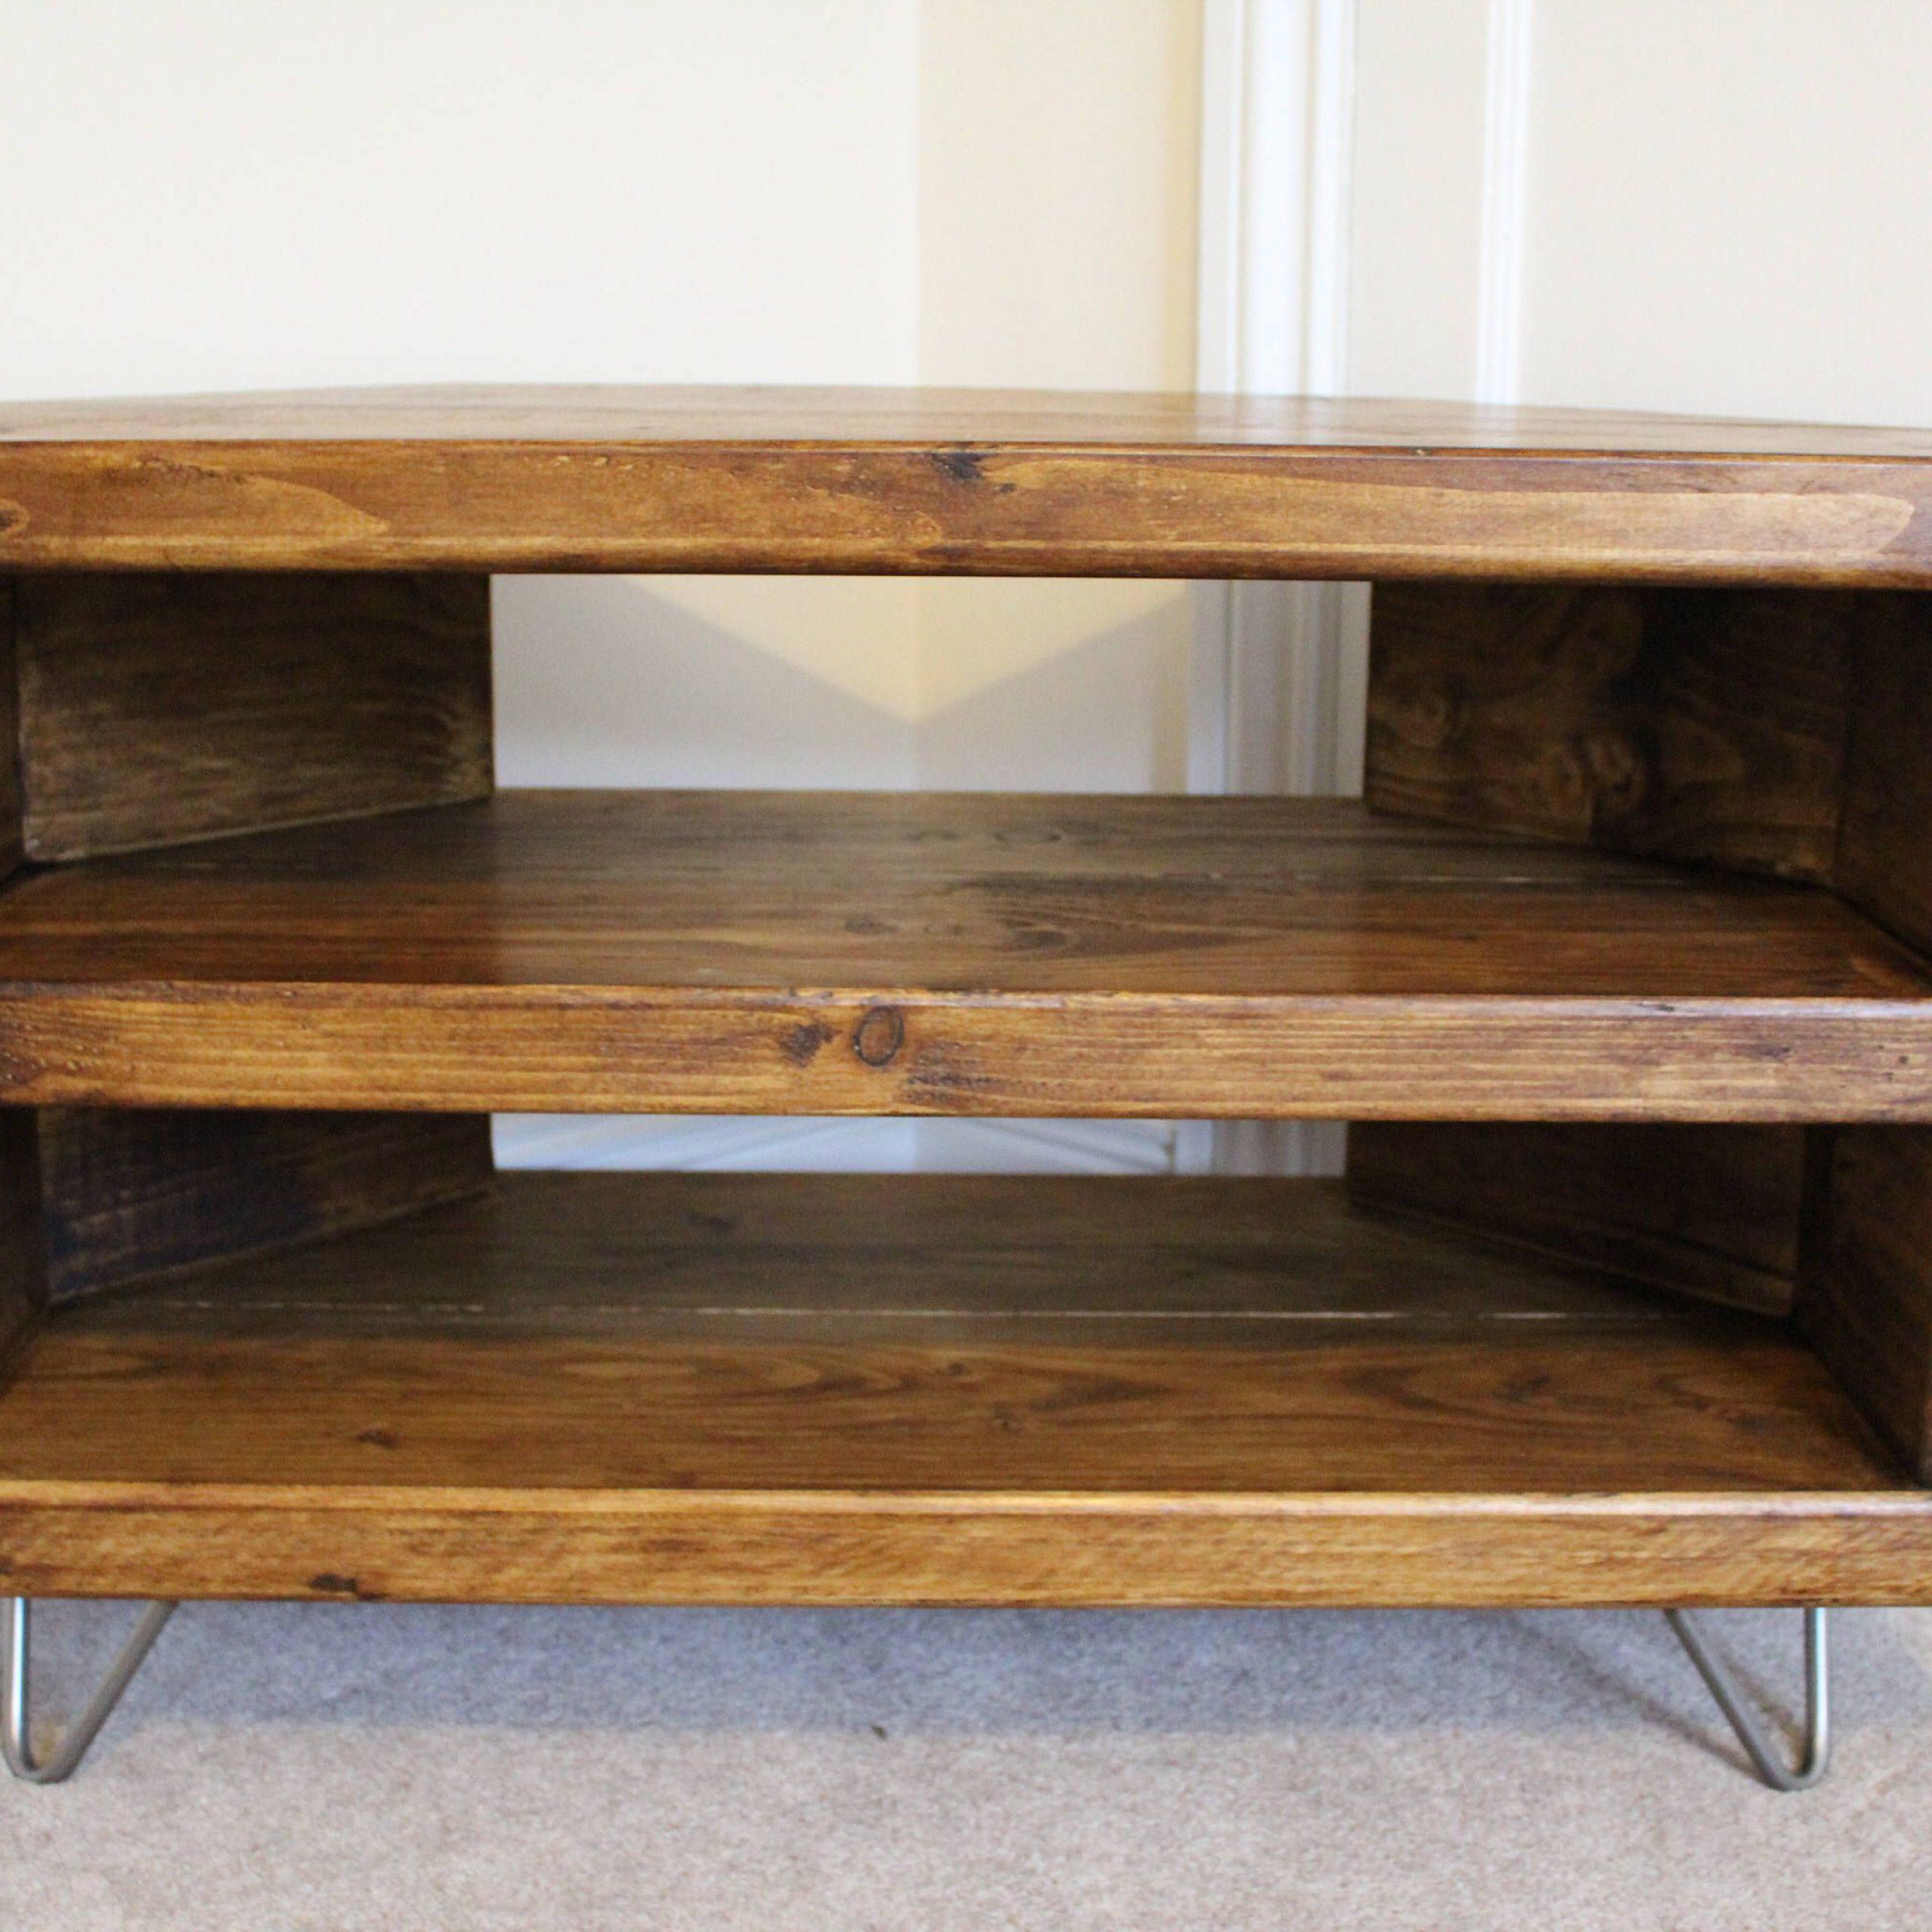 Reclaimed Rustic Wooden Corner Tv Stand Cabinet Unit Solid Inside Wooden Tv Stand Corner Units (View 4 of 15)